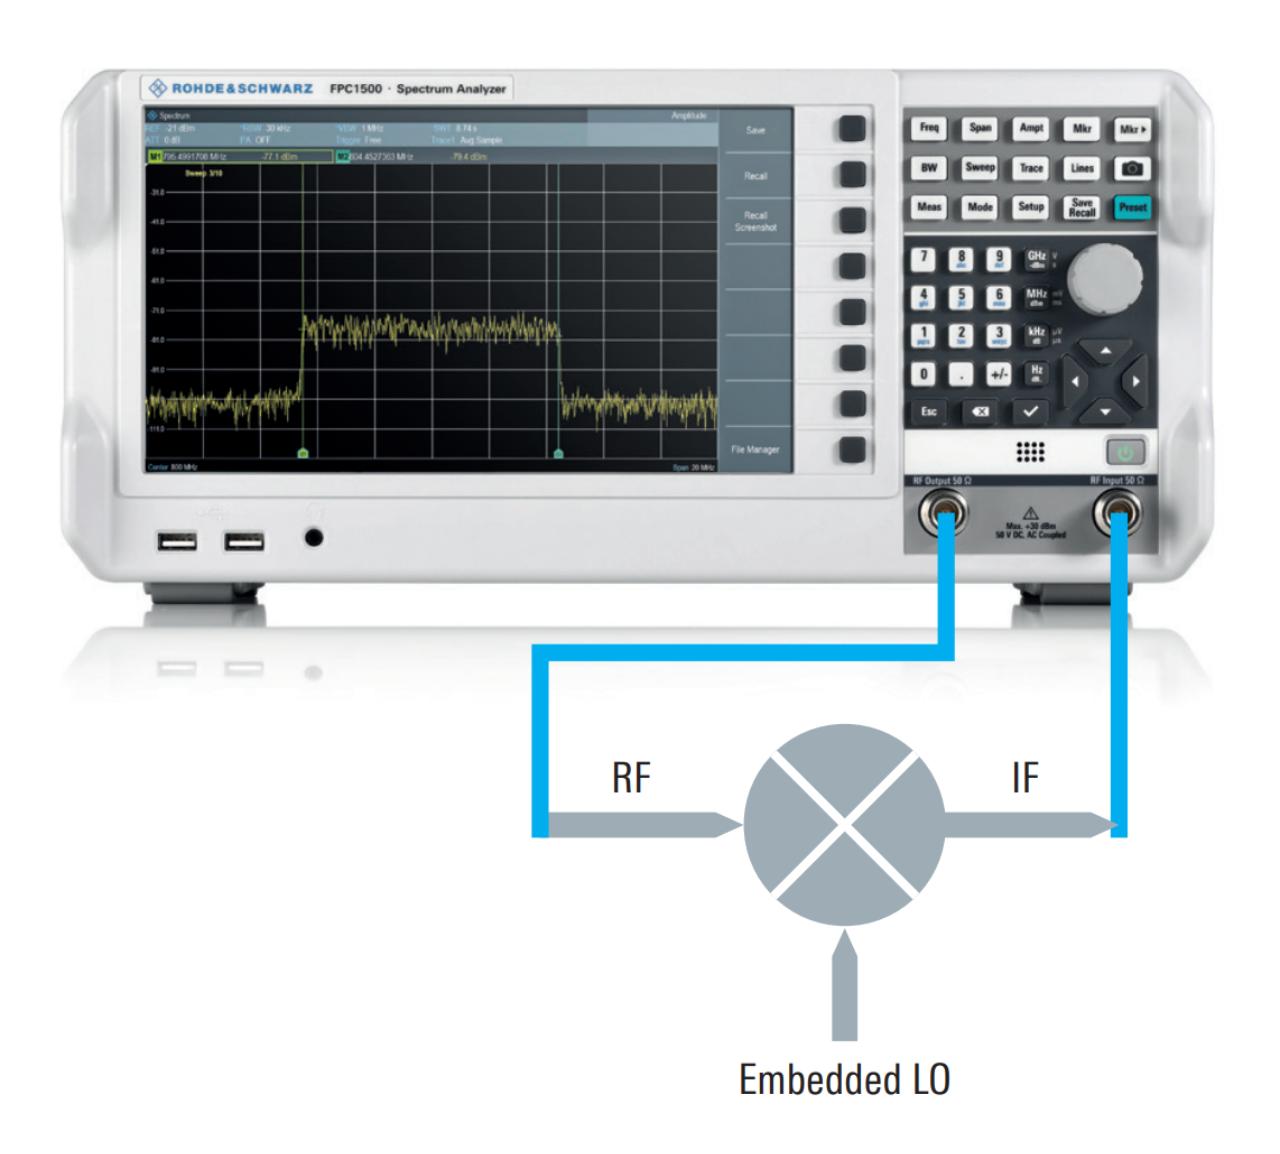 measure-key-mixer-performance-parameters_ac_5216-0796-92_02.png